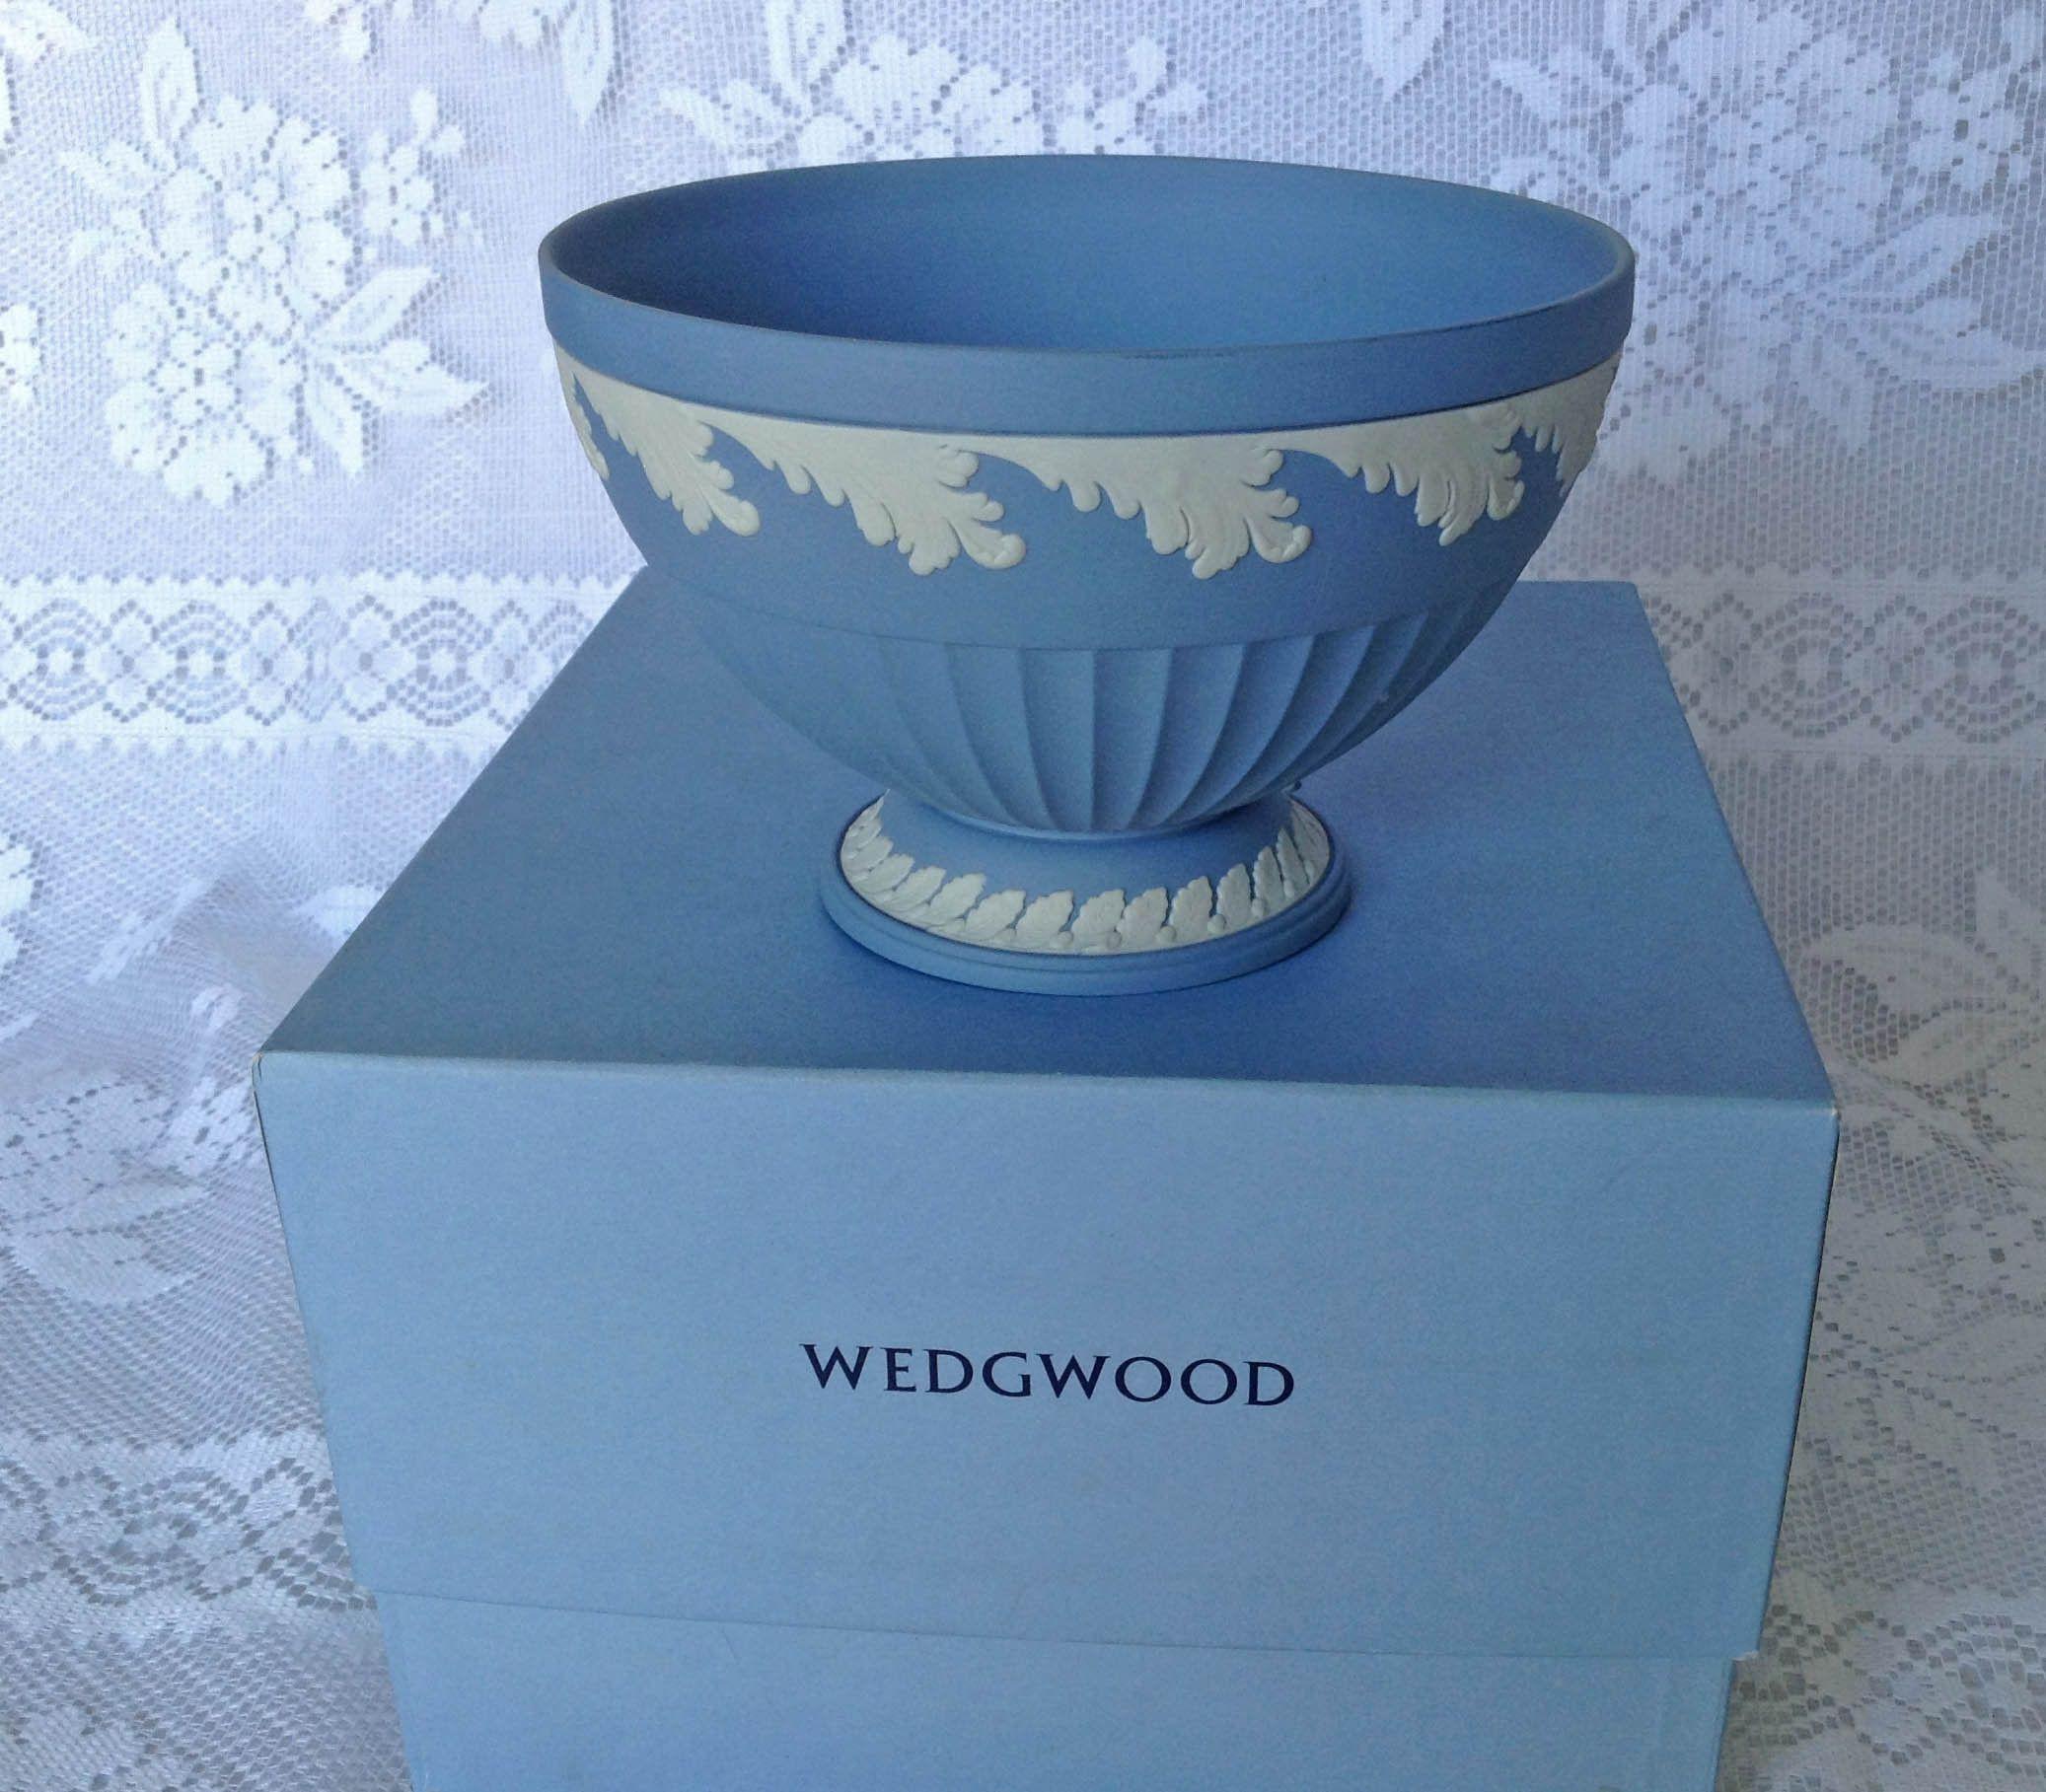 Wedgwood Jasperware Wedgwood Cream on Lavender Bowl MINT Condition Beautiful Pedestal Wedgwood Bowl New In Box